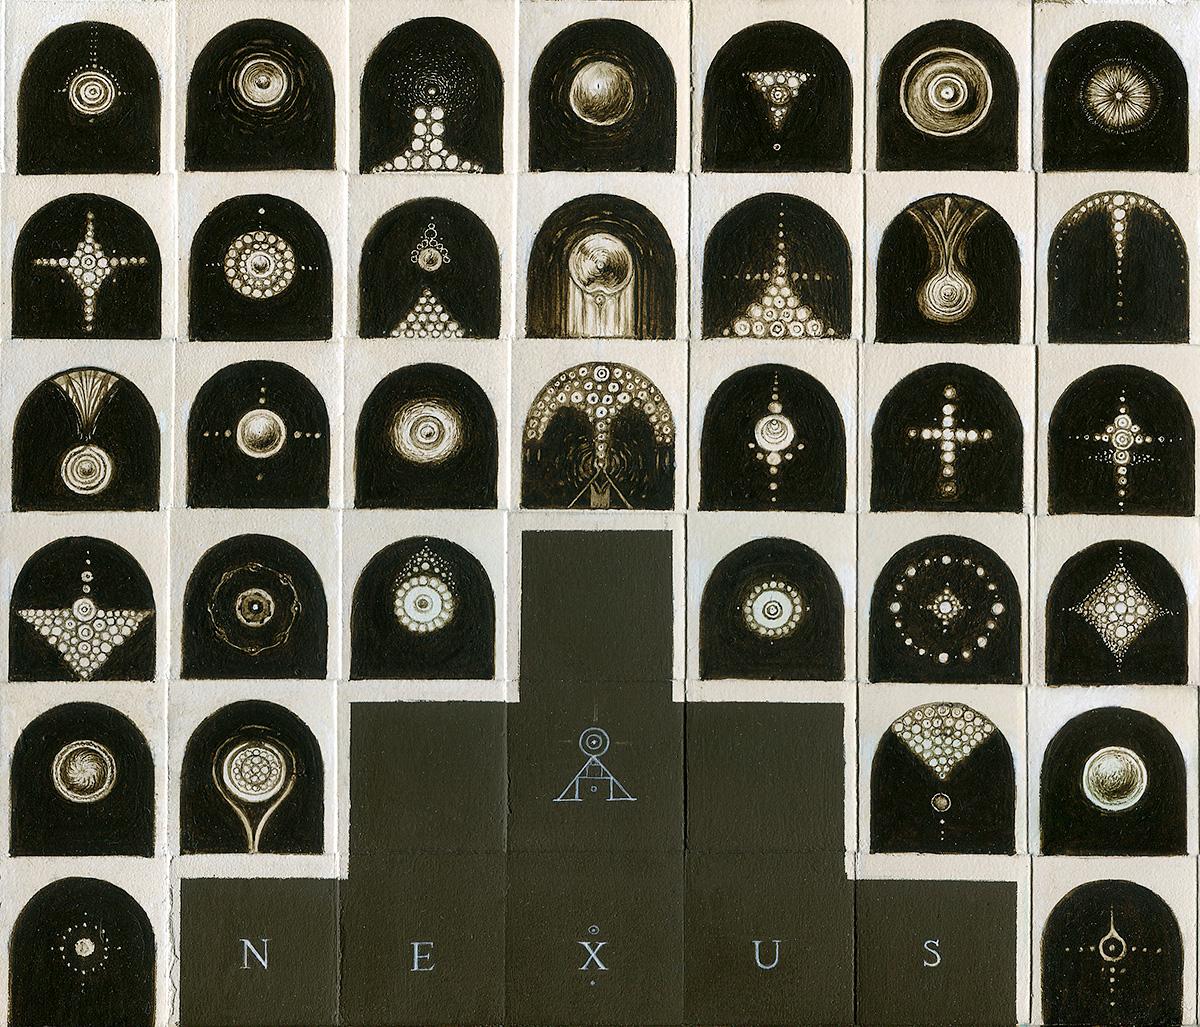 NEXUS (fragment)